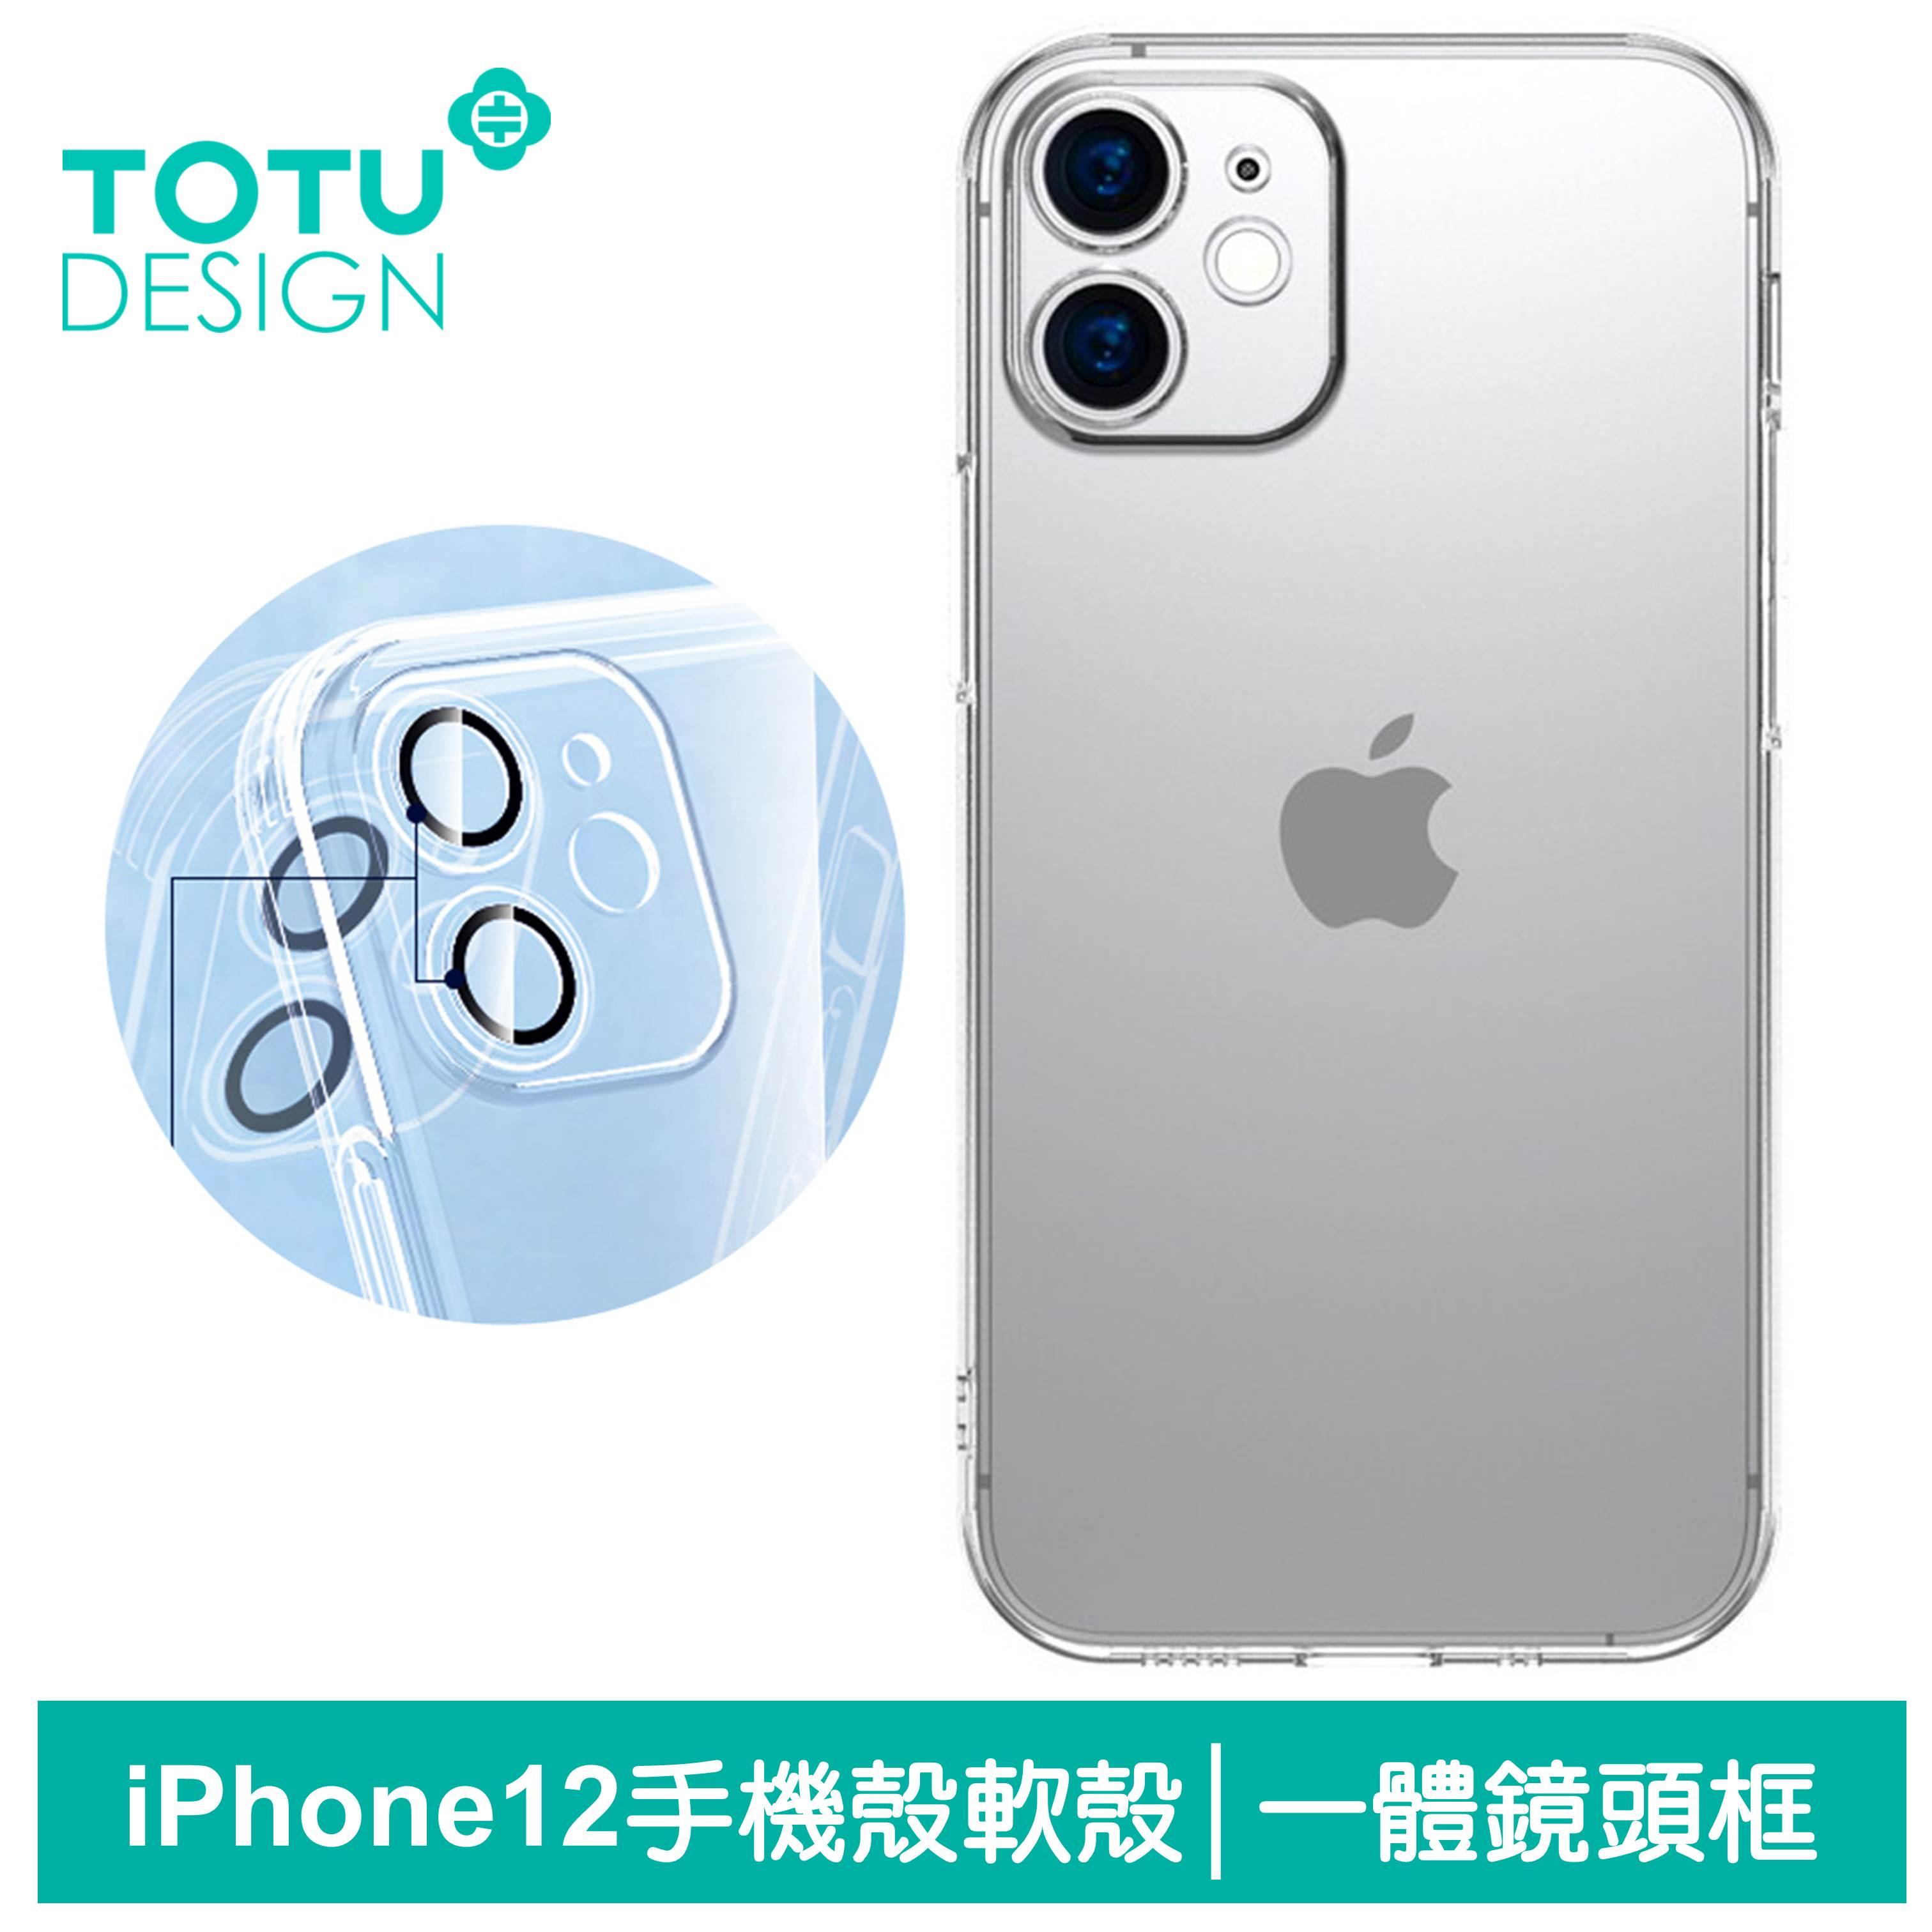 TOTU台灣官方 iPhone 12 手機殼 i12 保護殼 6.1吋 防摔殼 軟殼 一體鏡頭框 柔精裝 透明